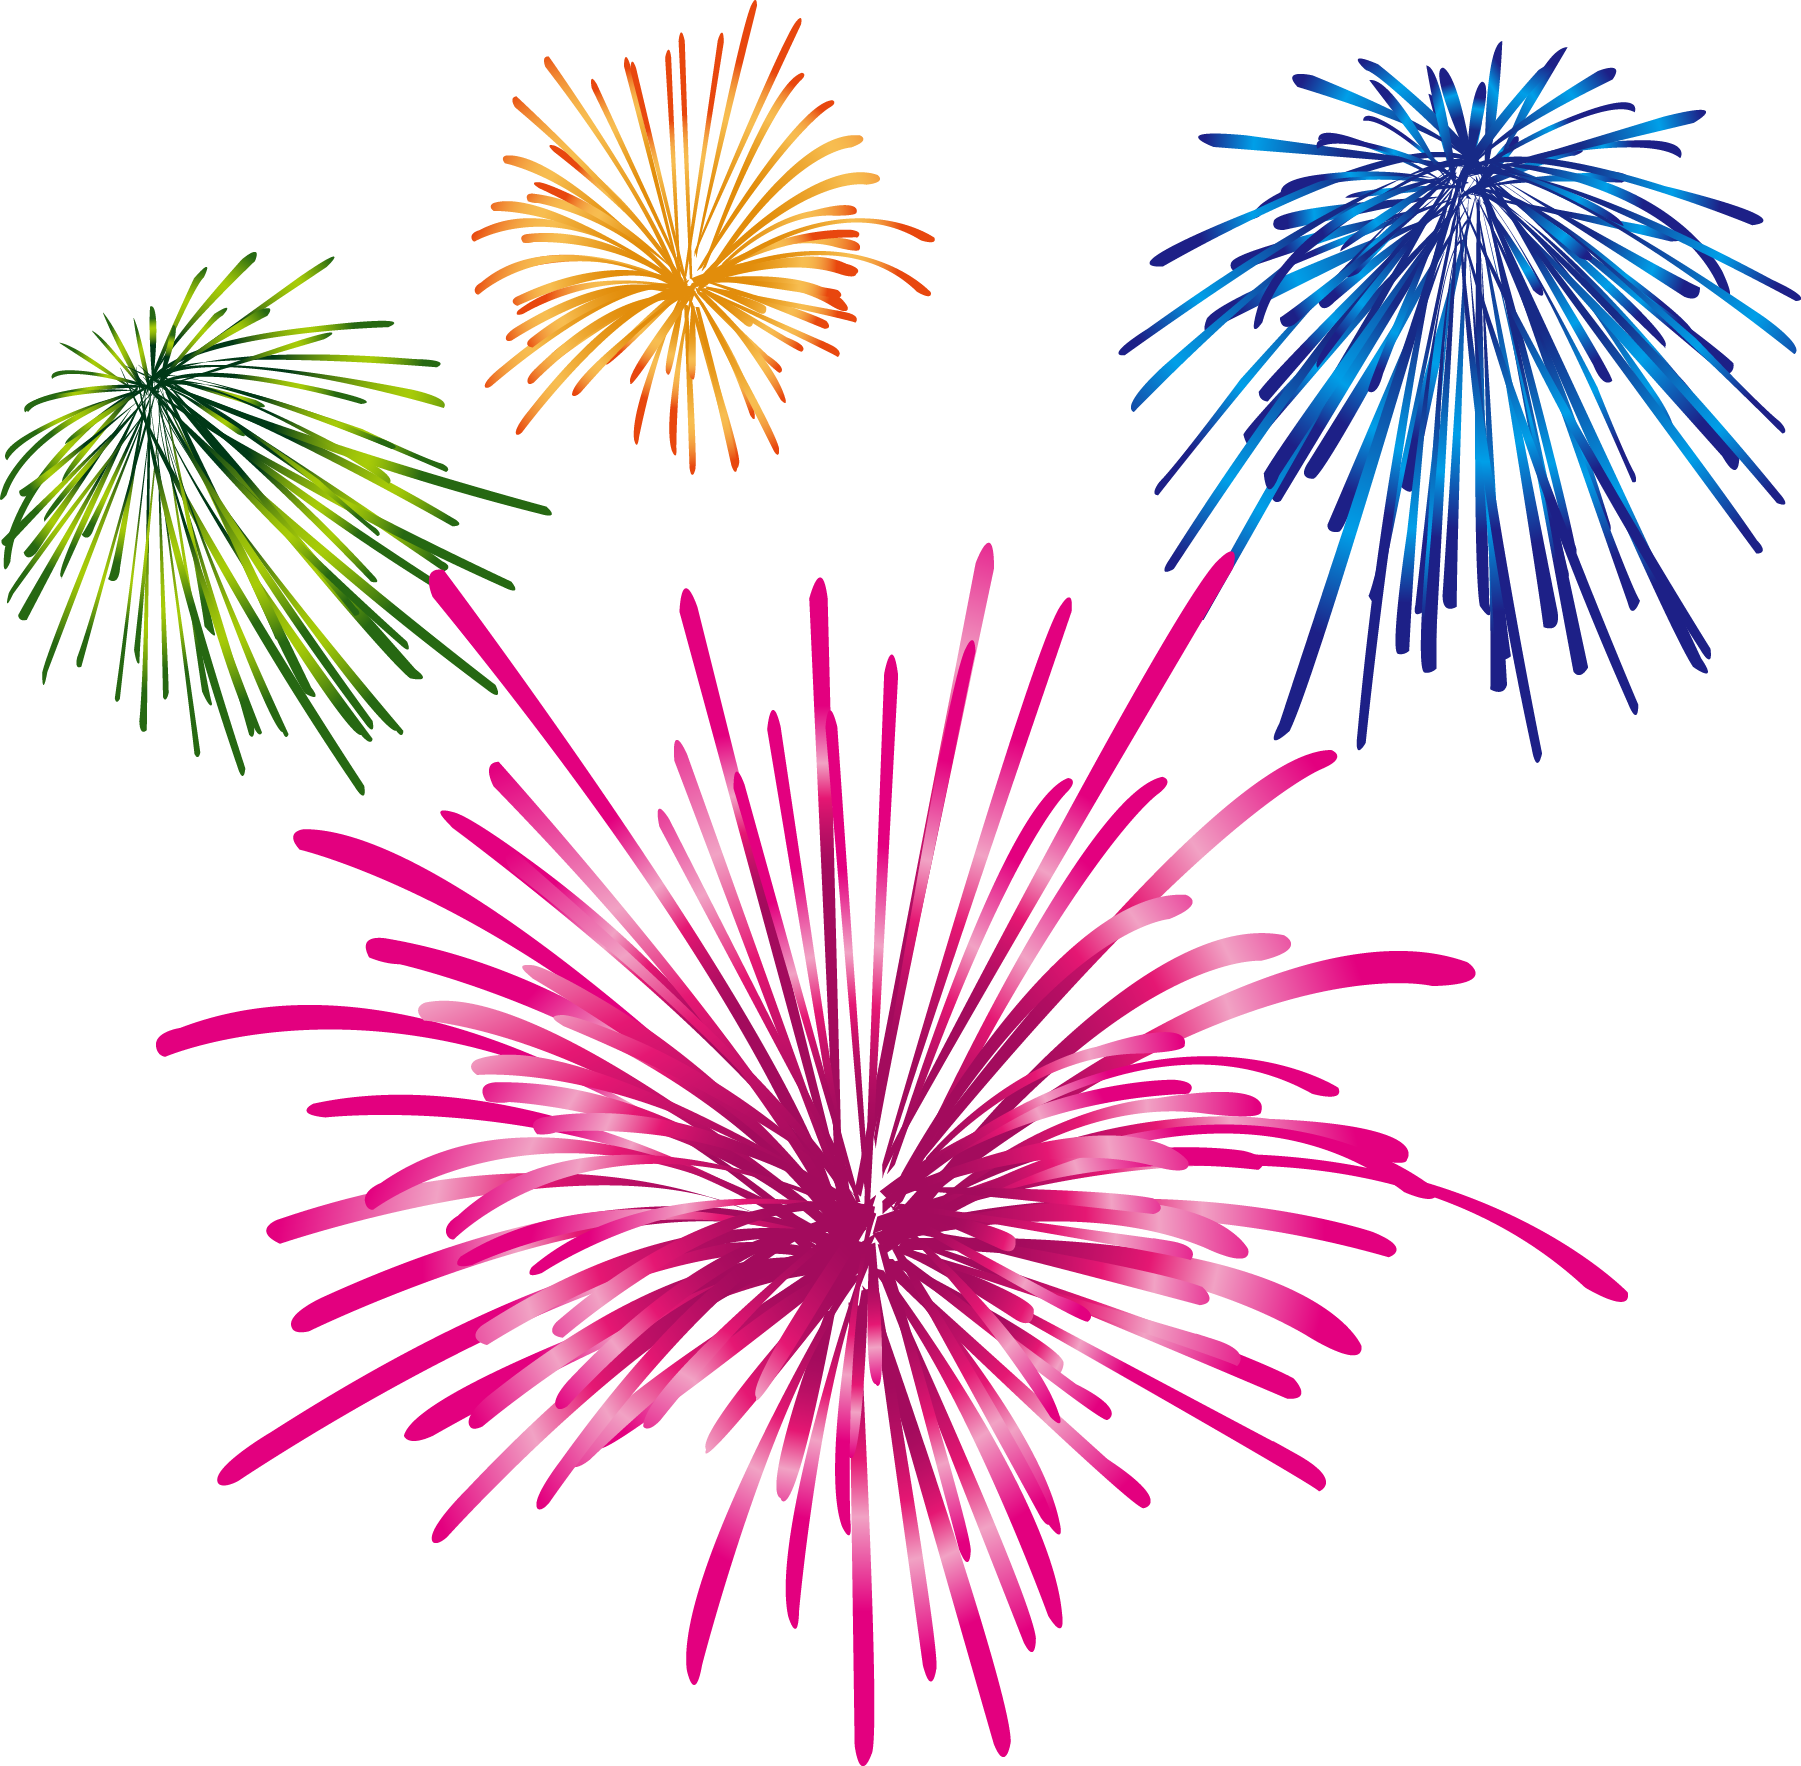 vector library library Fireworks Cartoon